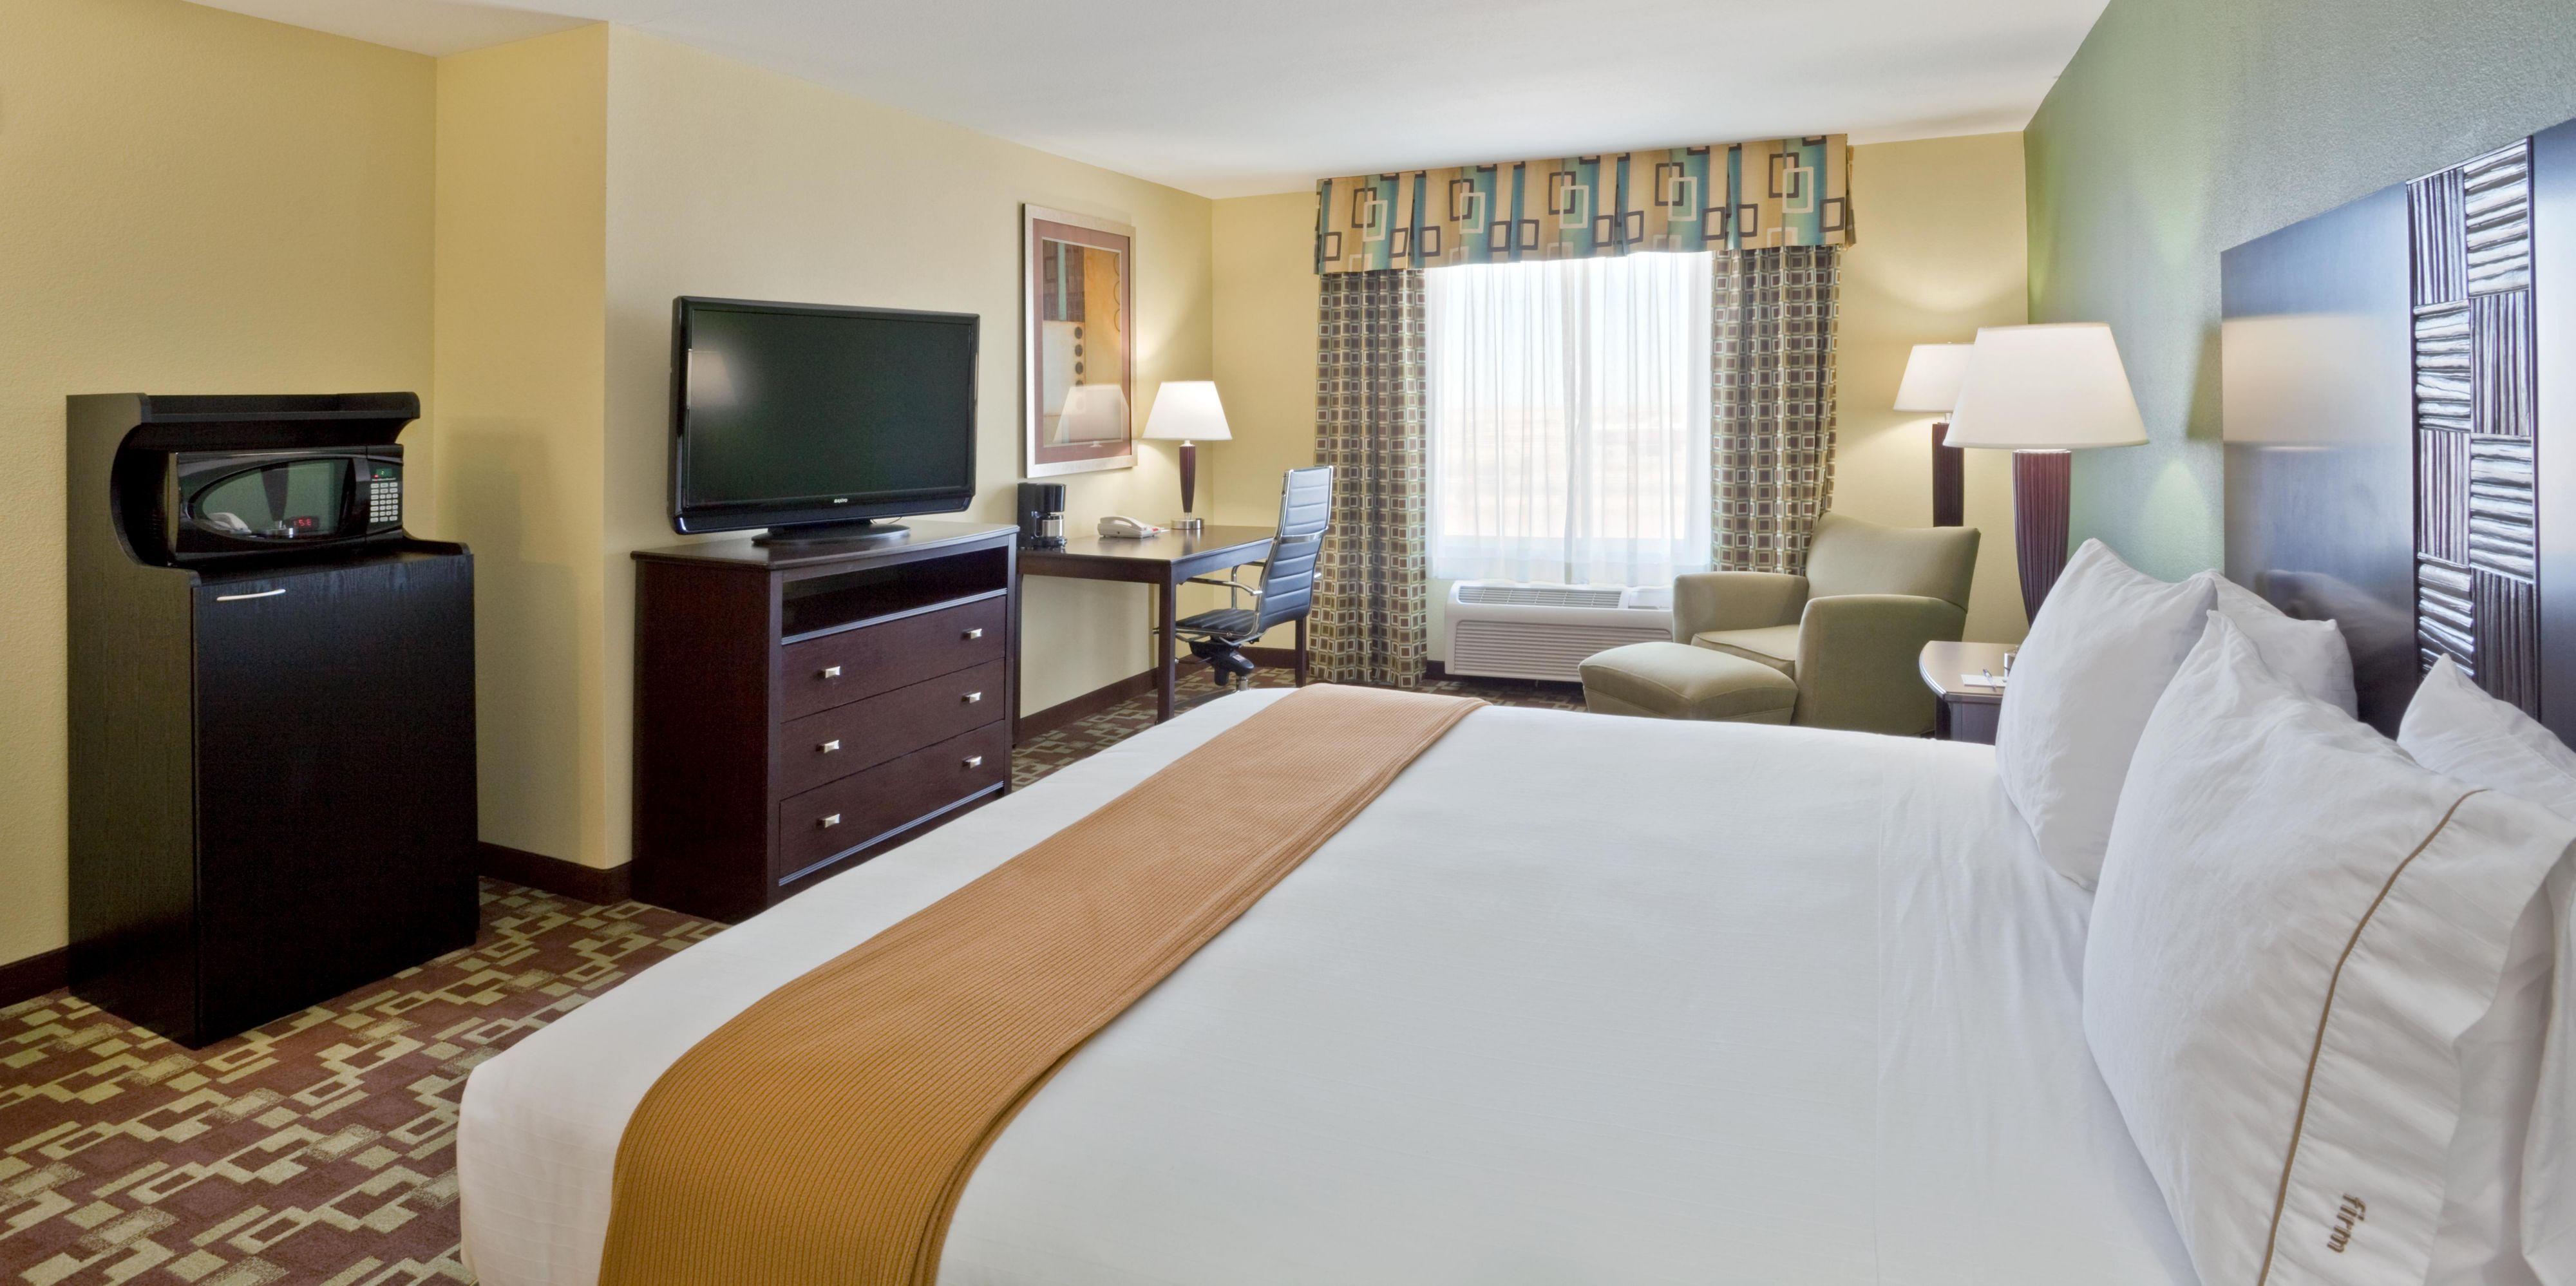 dumas texas hotels